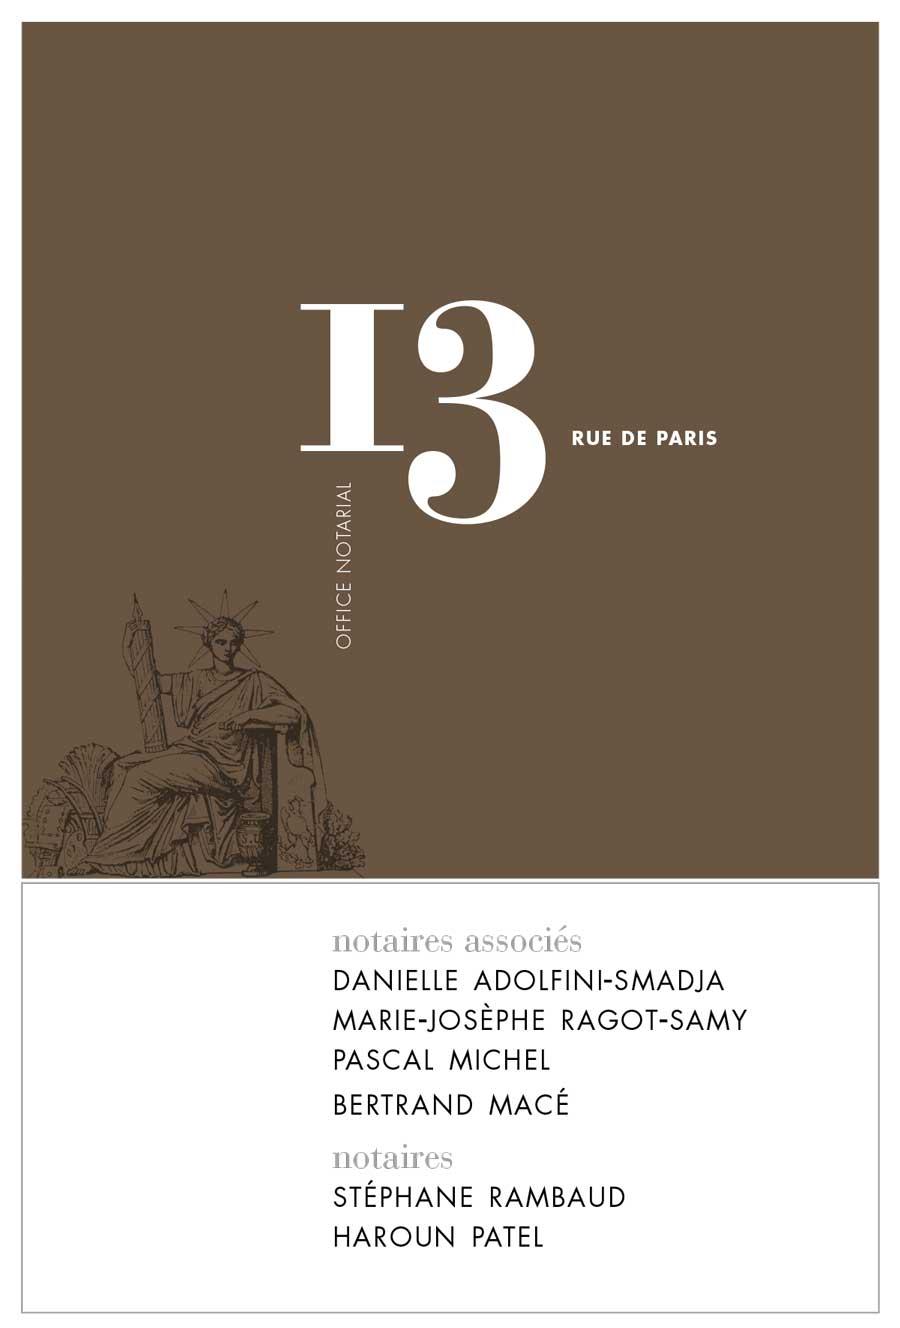 13-rue-de-paris